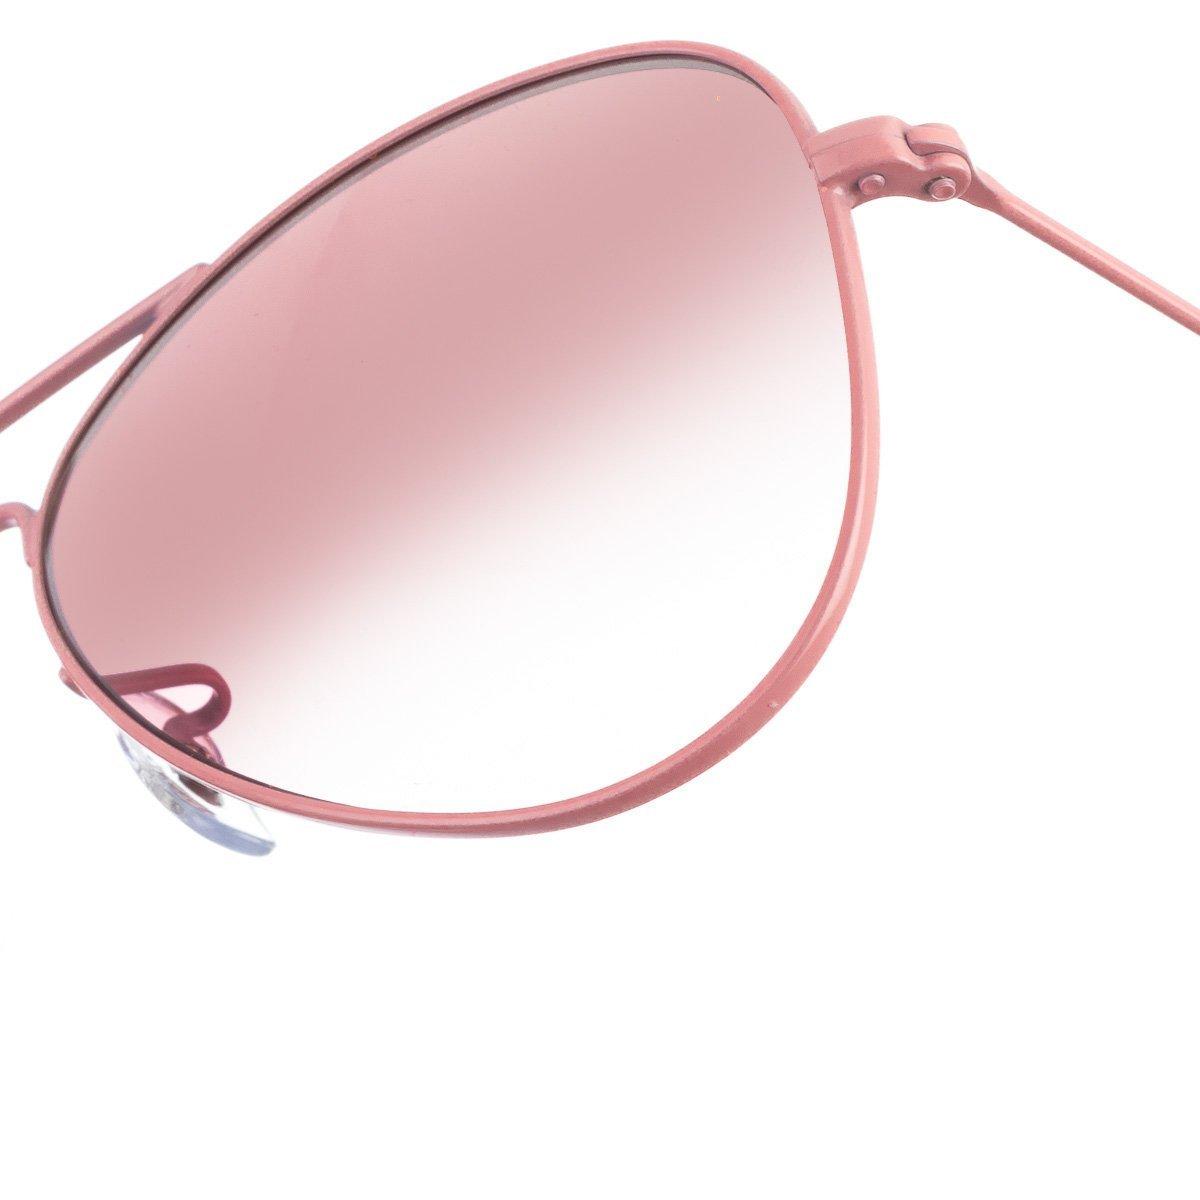 ray ban aviator sunglasses amazon uk